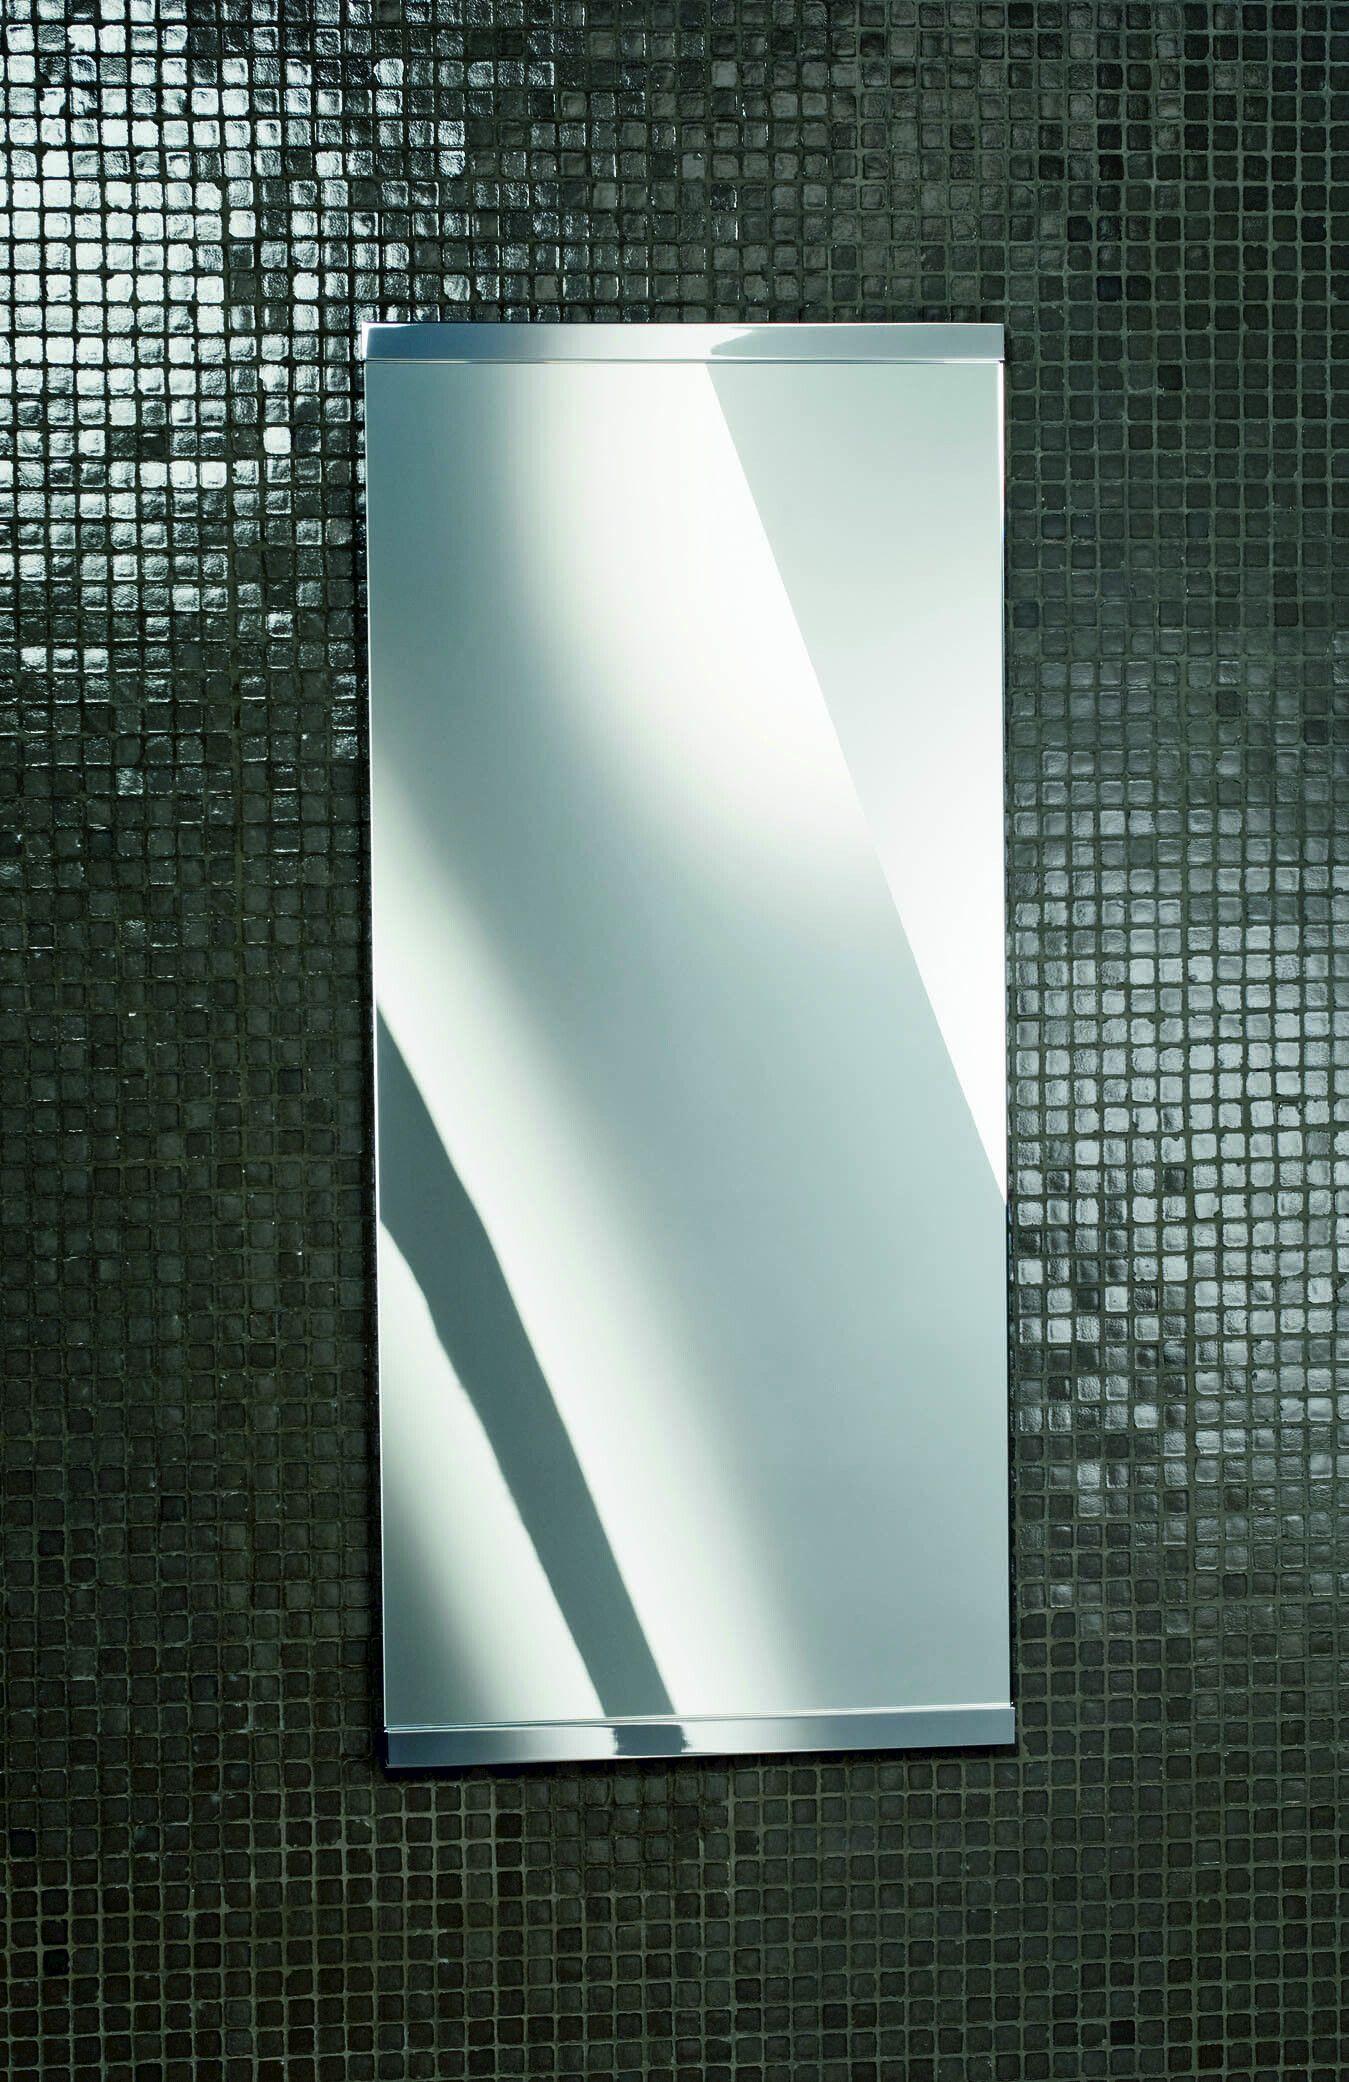 Miroir rectangulaire mural pour salle de bain sp 90 by for Colle pour miroir mural